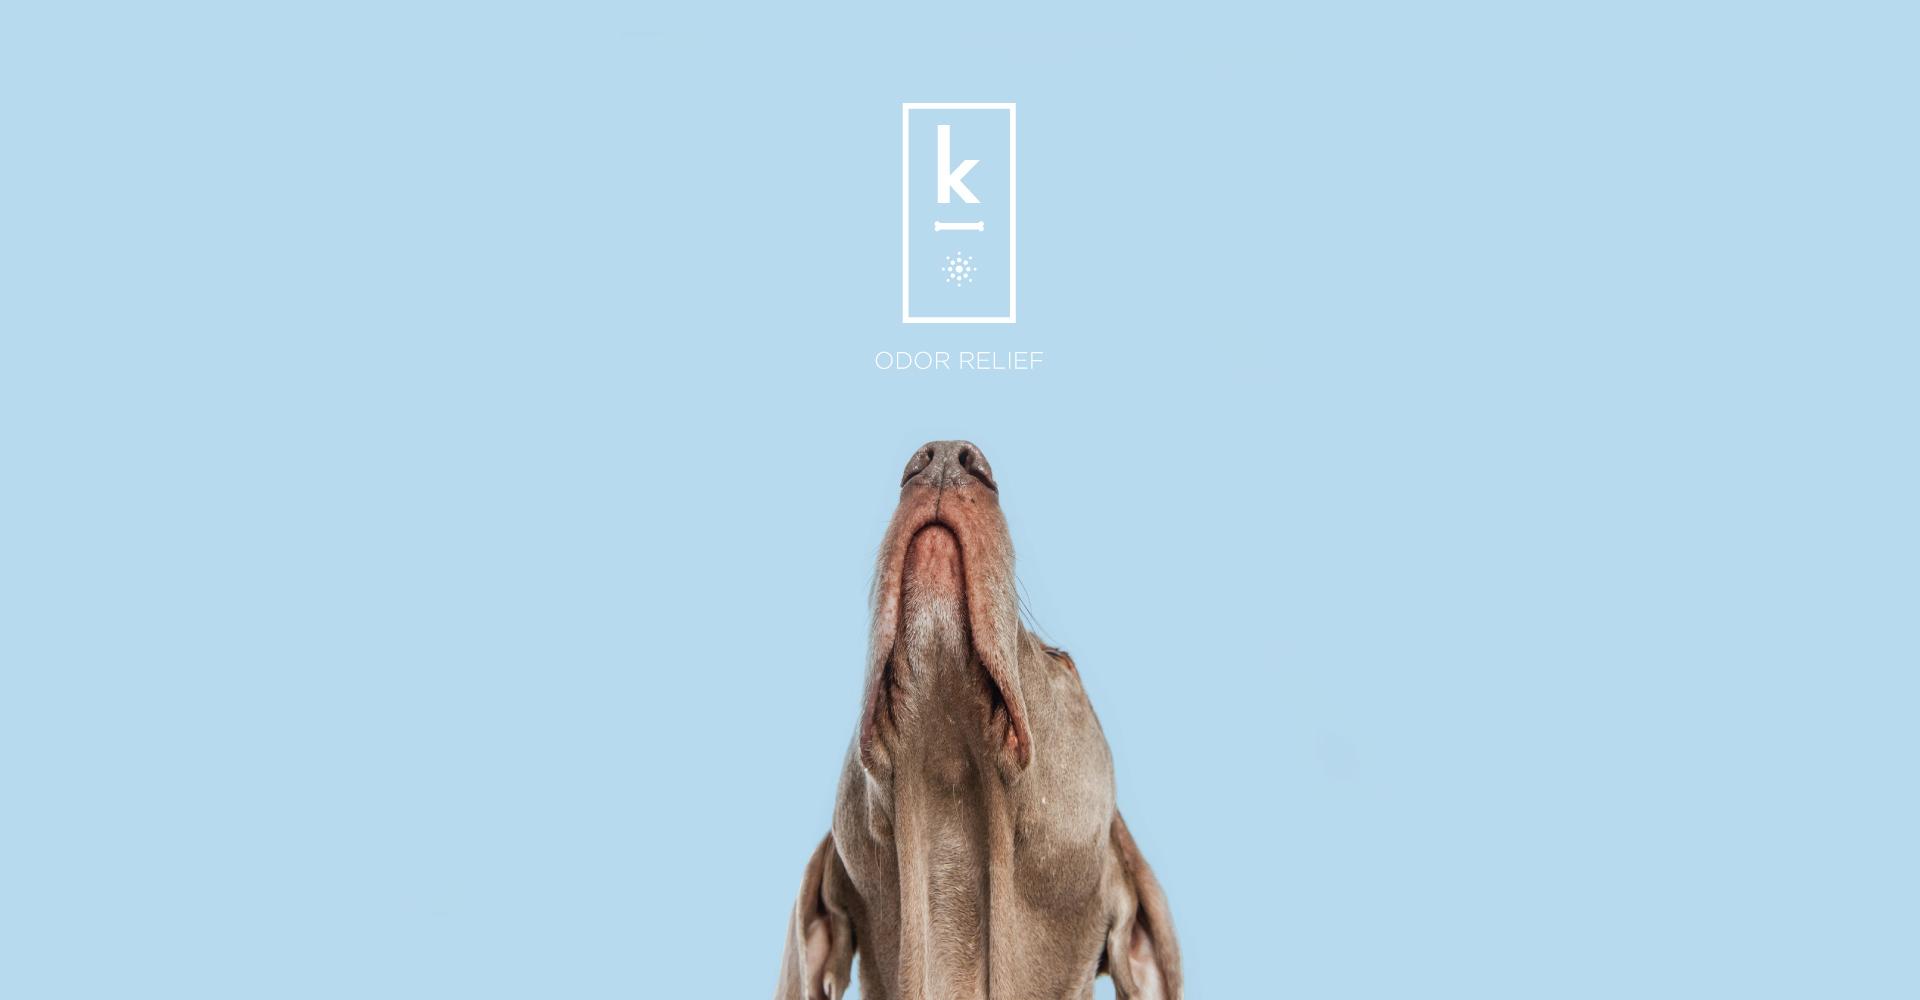 Creative_Retail_Packaging_Branding_Identity_Design_Klementime_10.jpg